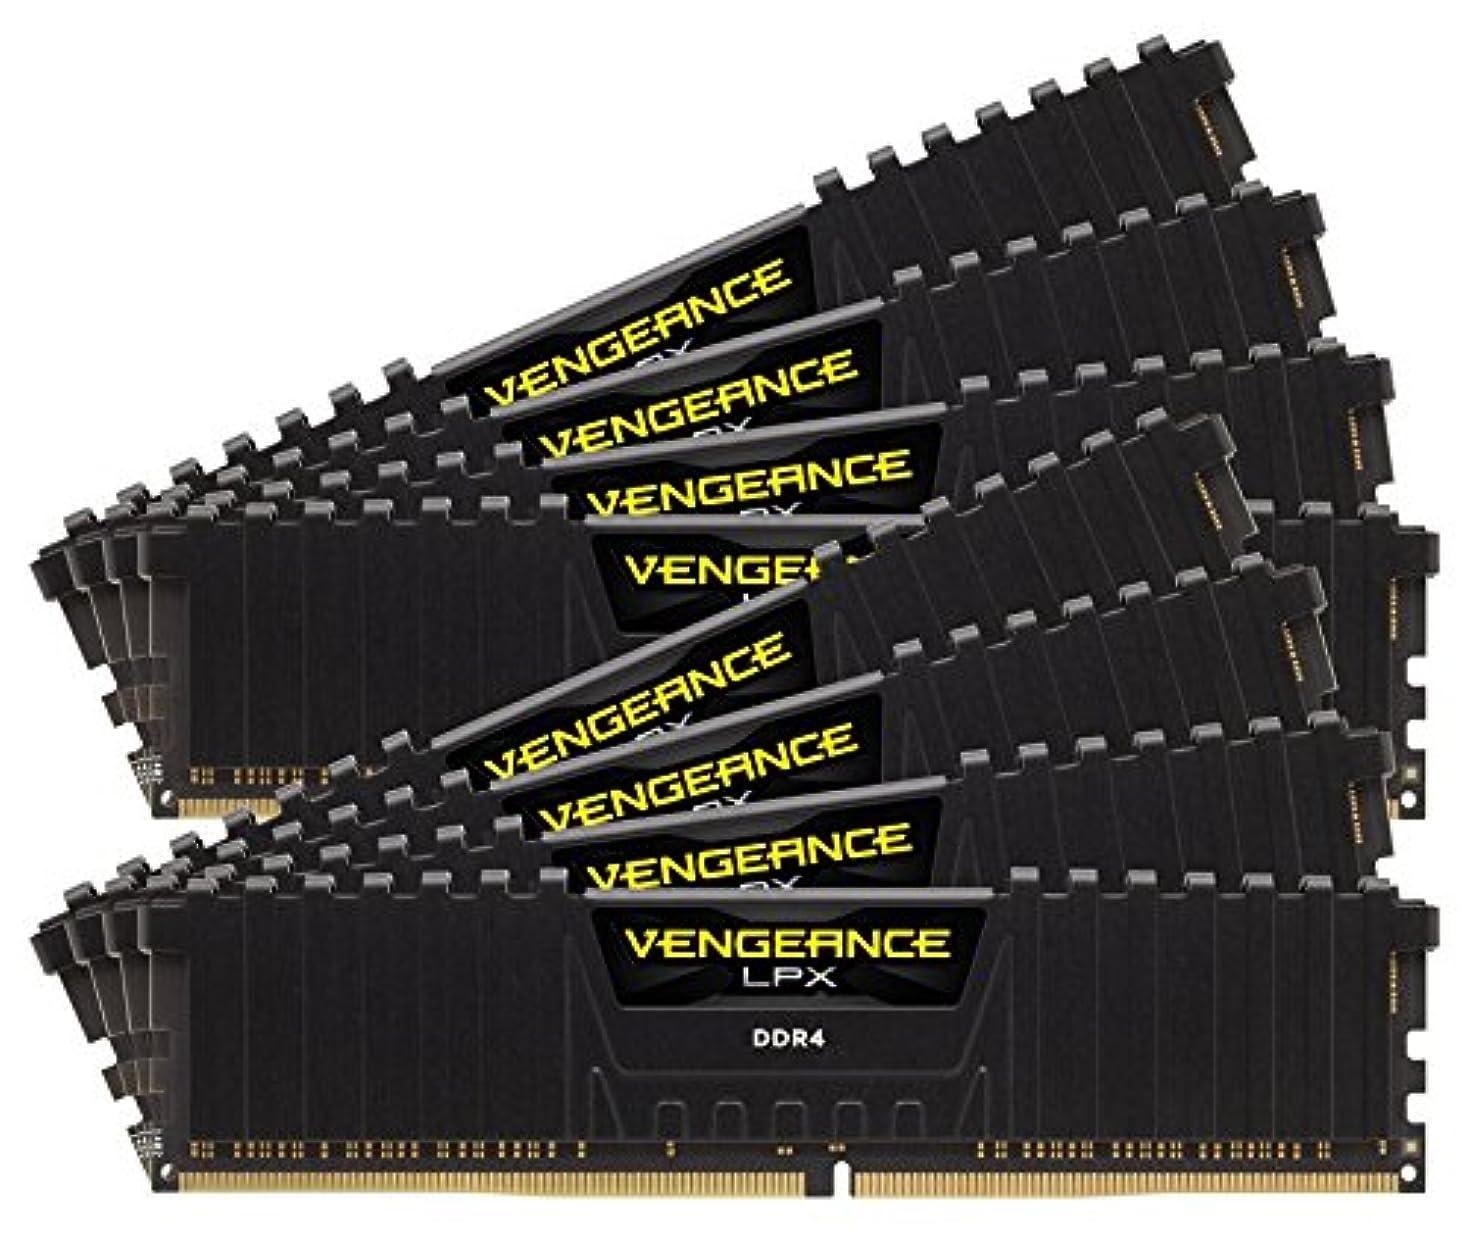 Corsair CMK128GX4M8Z2933C16 Vengeance LPX 128GB (8x16GB) DDR4 2933 (PC4-23400) C16 Desktop Memory for AMD Threadripper